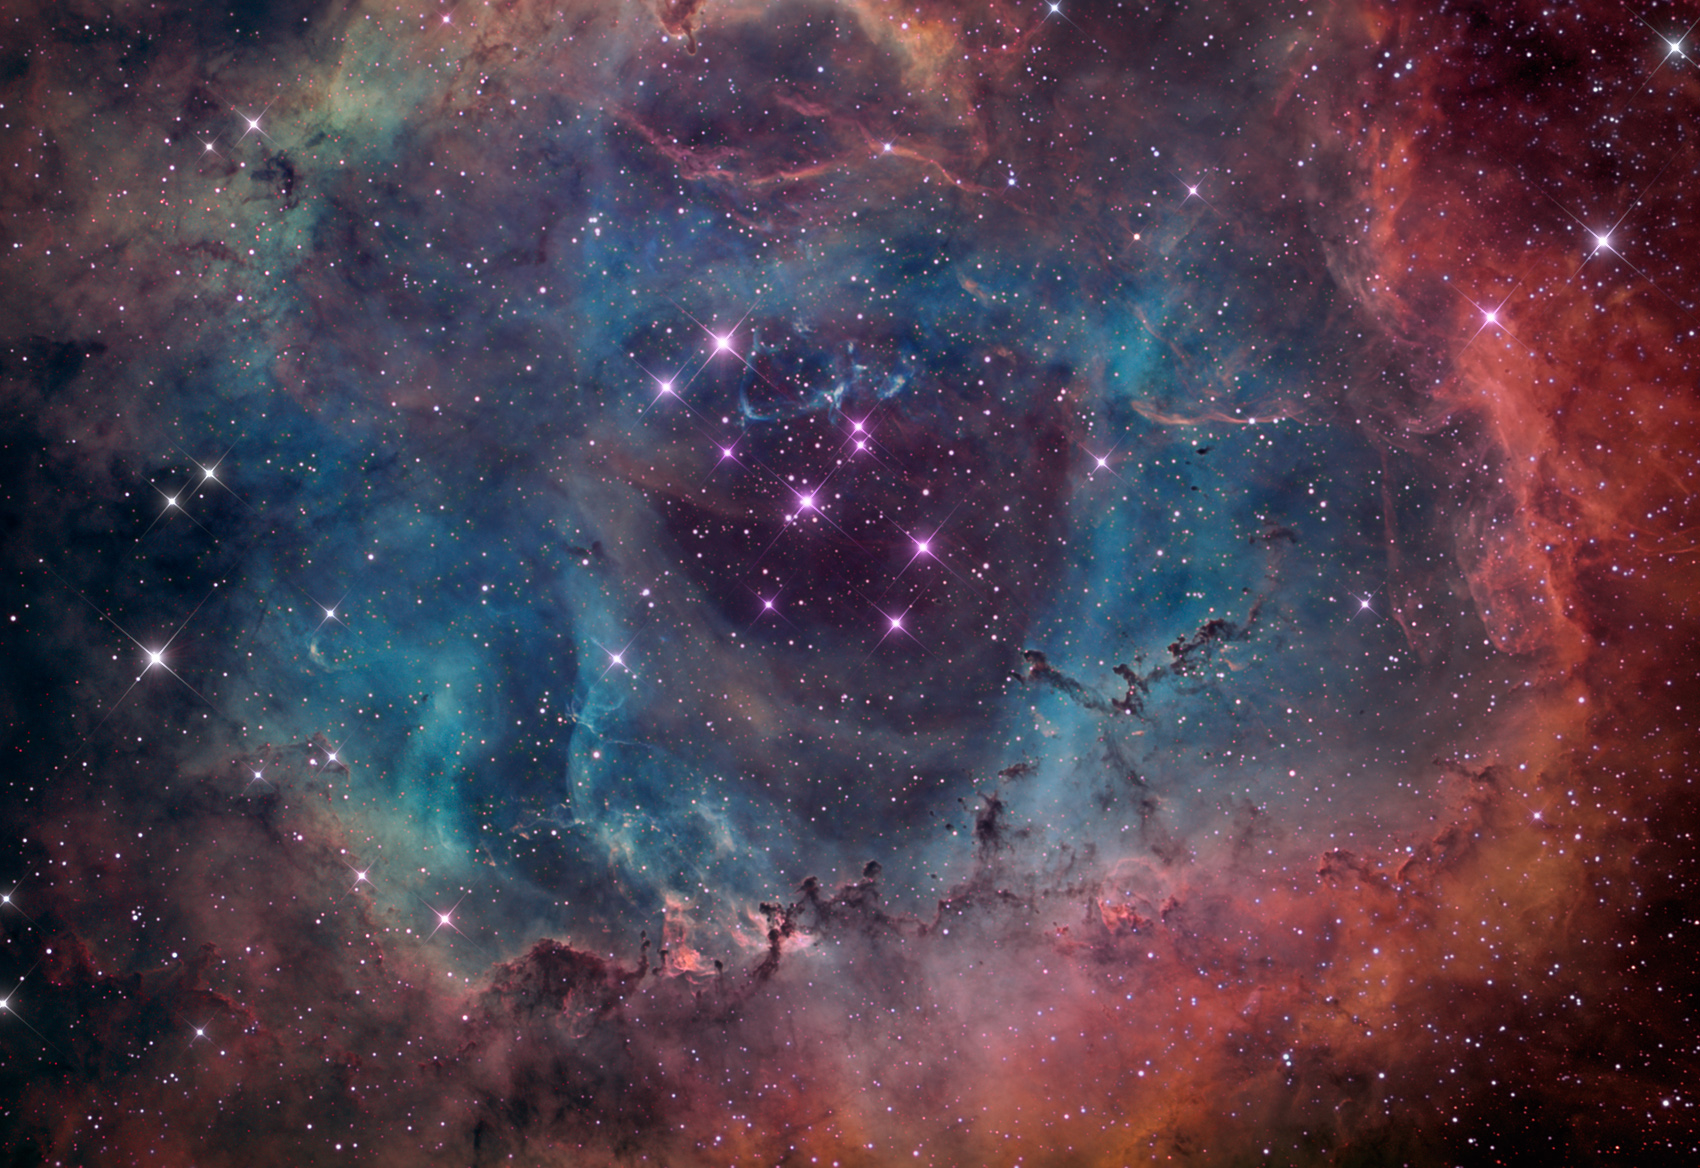 Nebula Wallpapers wallpaper Space Nebula Wallpapers hd wallpaper 1700x1168